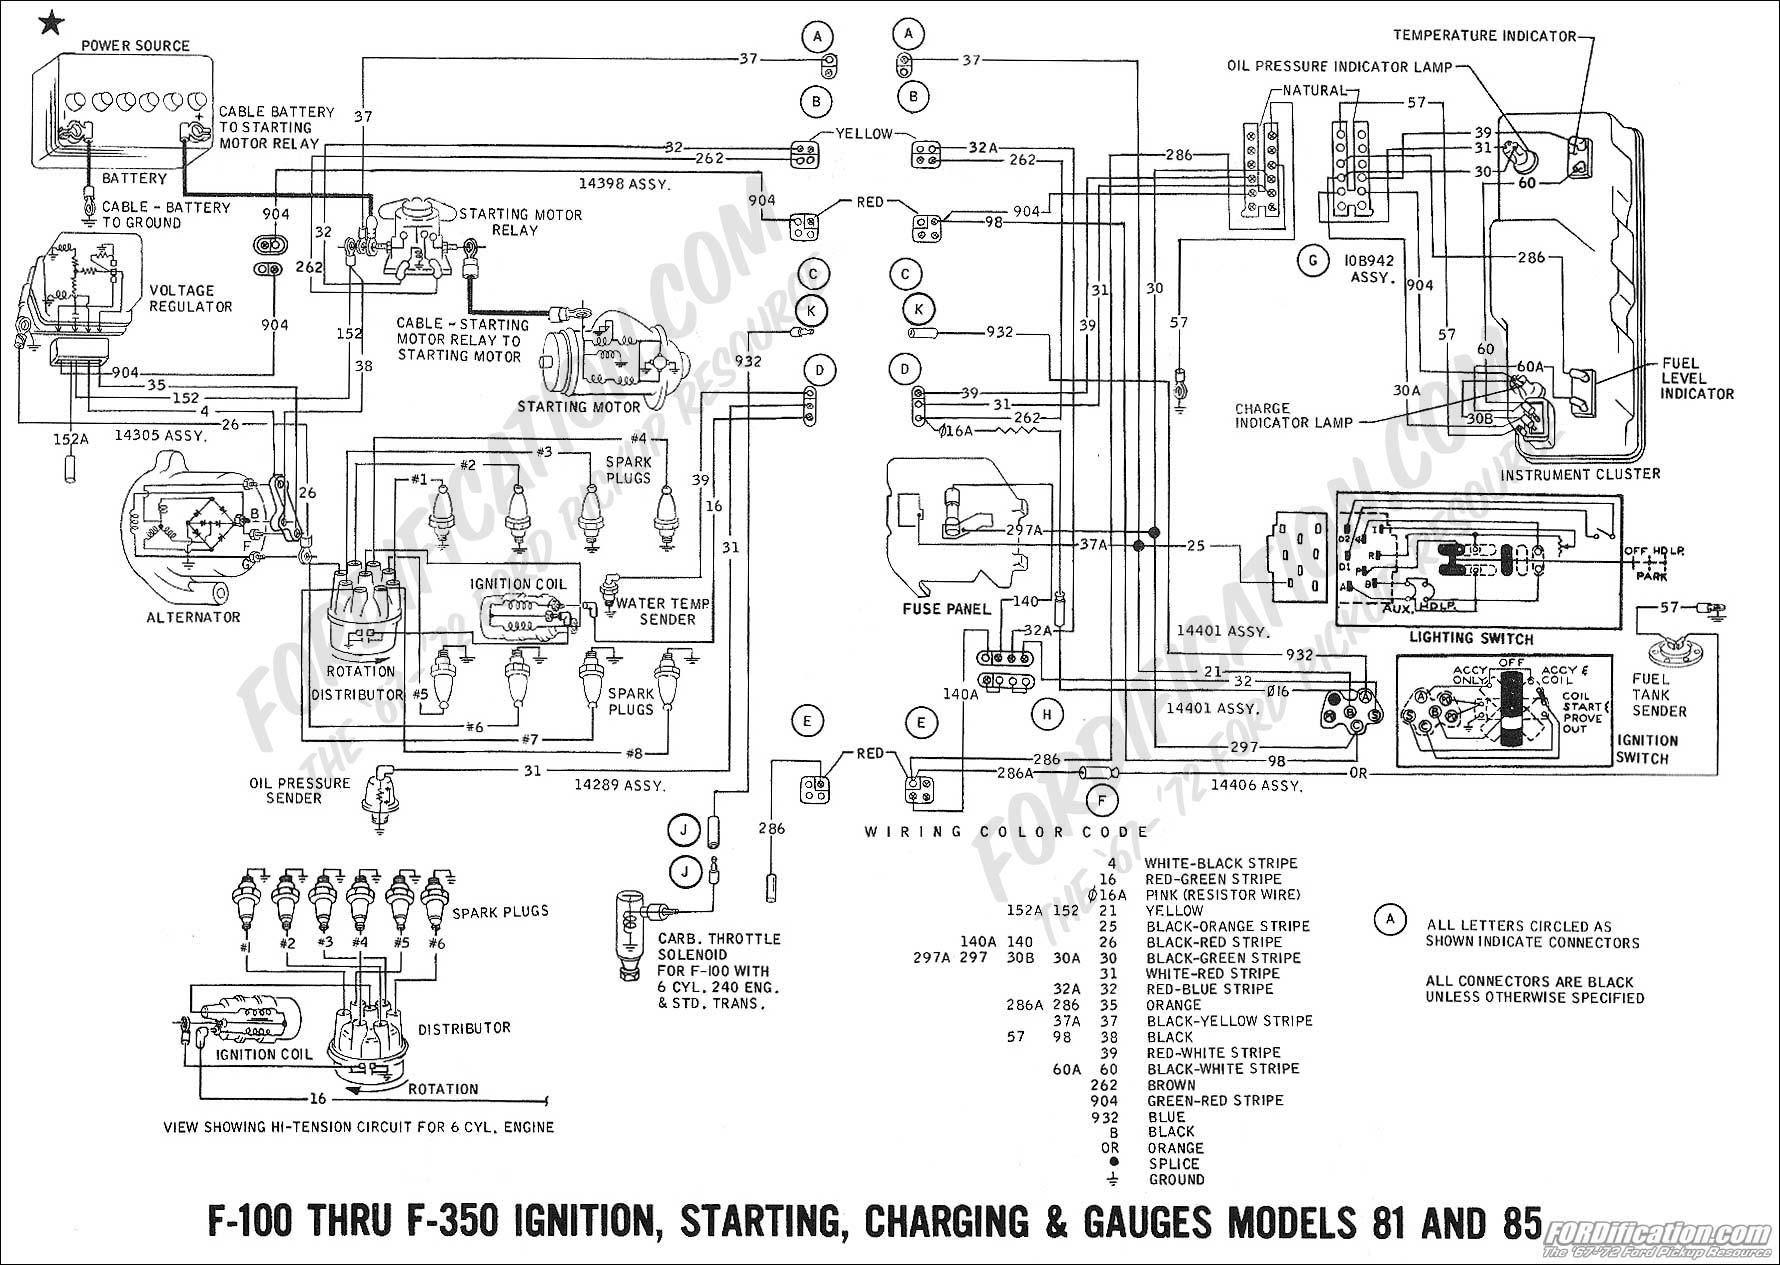 1987 Ford F800 Dump Truck Wiring Diagram   Ford F800 Truck Wiring Diagrams      artedaprincesona.blogspot.com